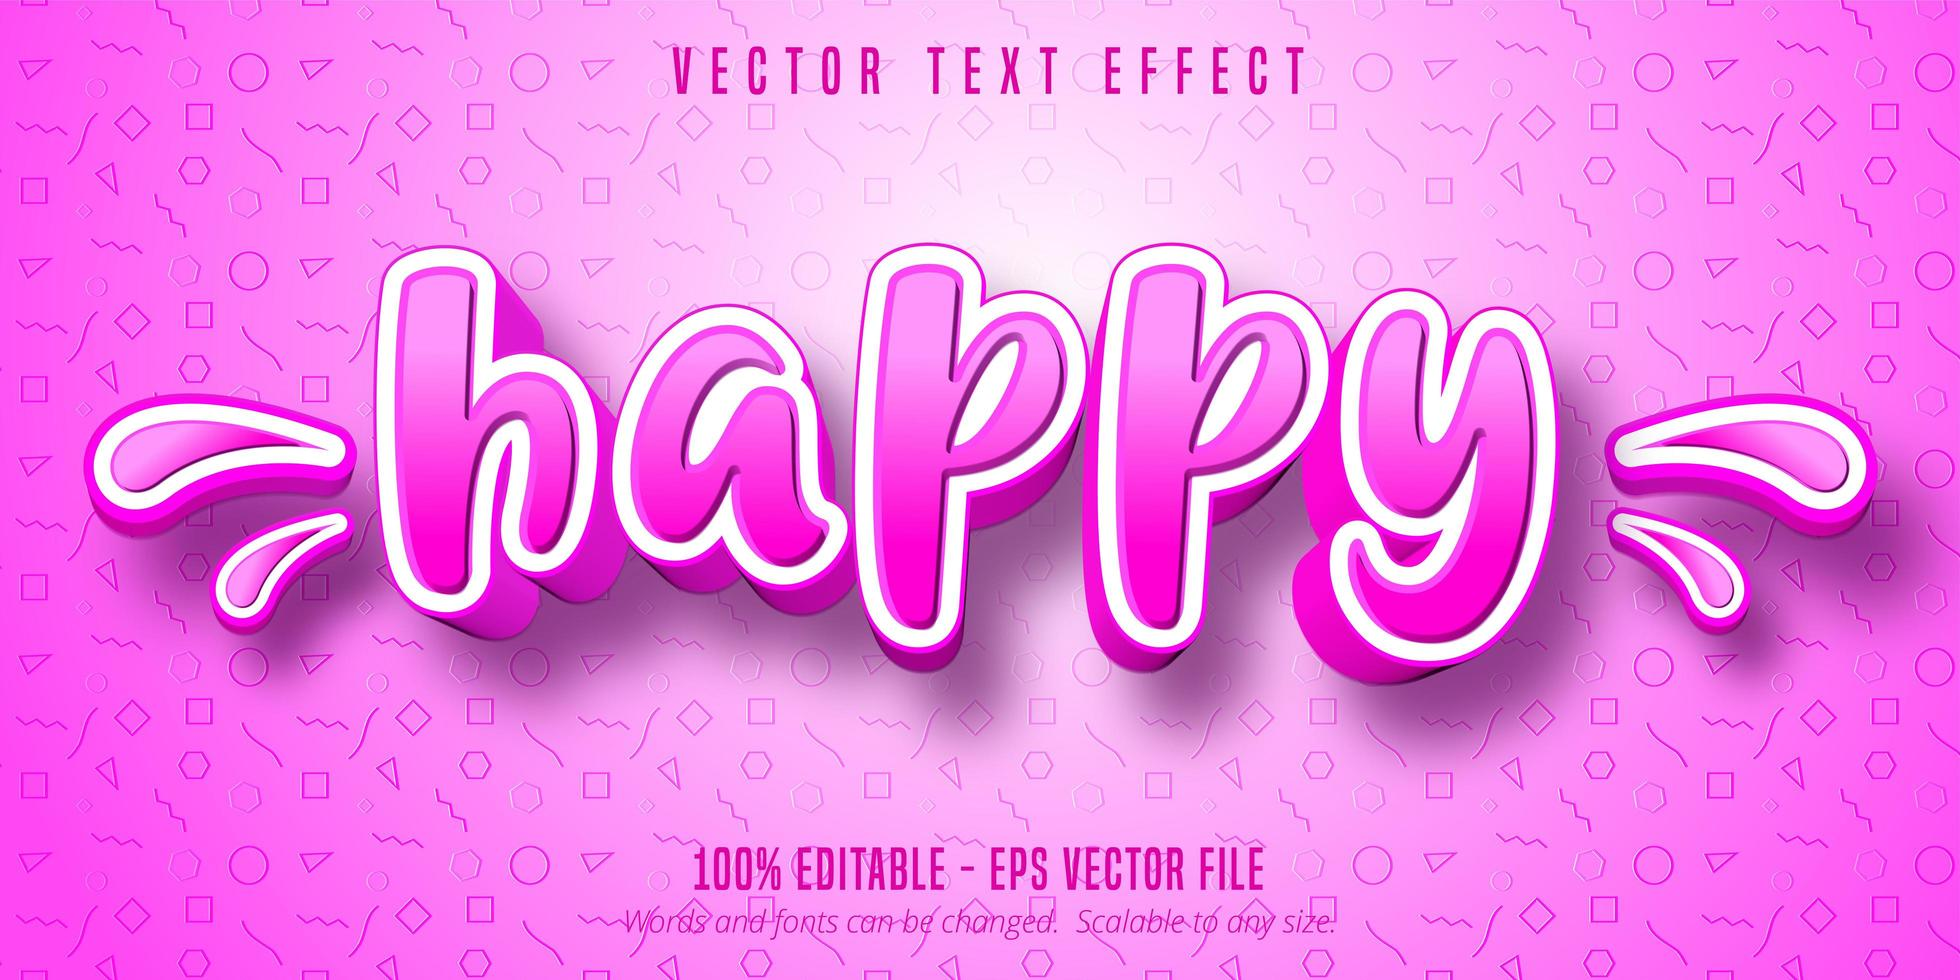 efeito de texto editável estilo cartoon feliz rosa e branco vetor